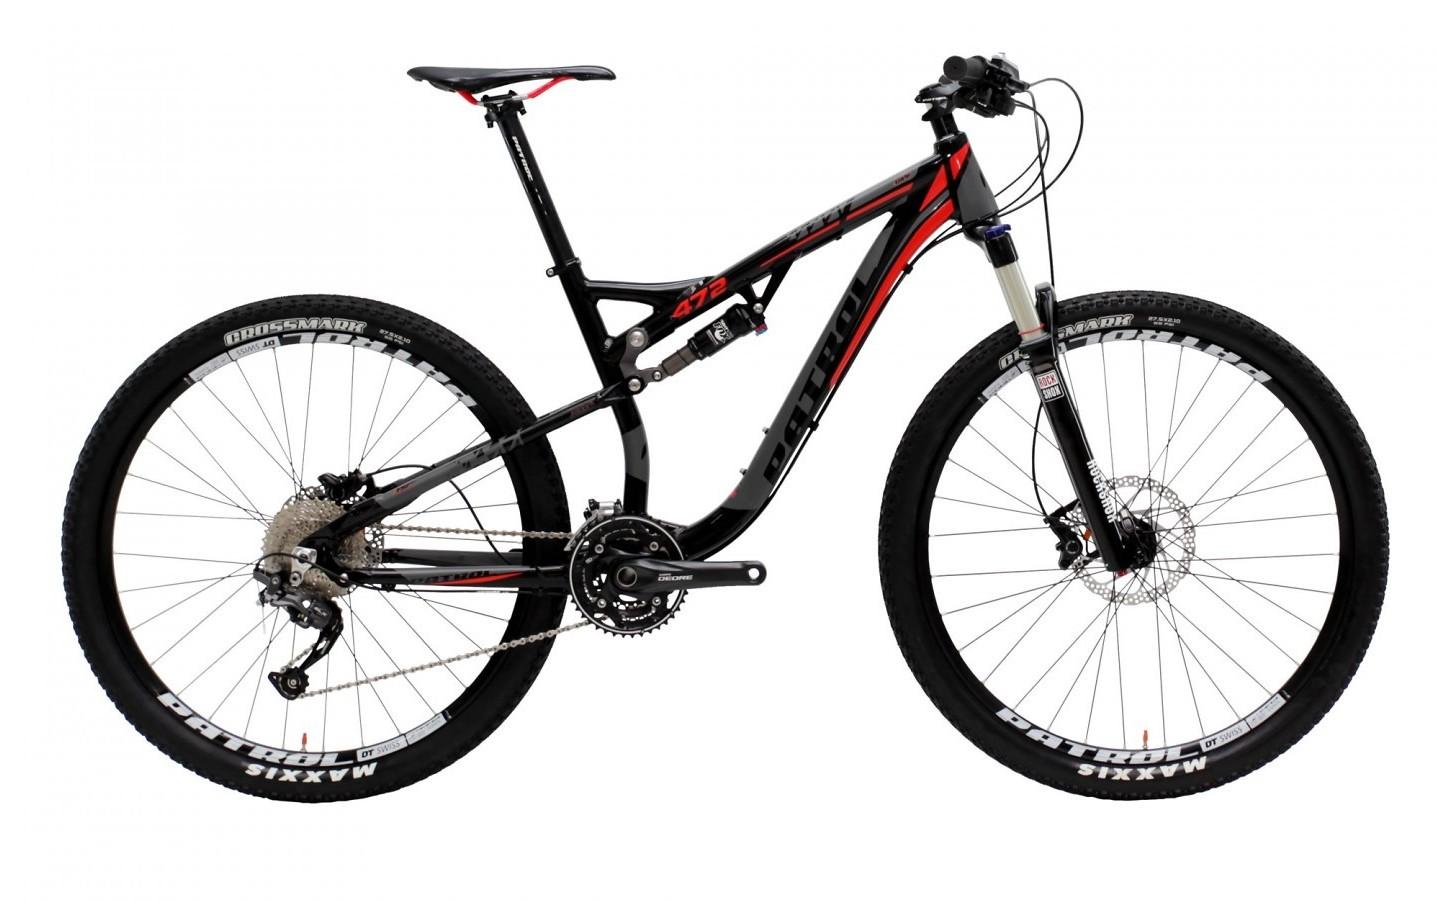 2017 Patrol 472 Bike - Reviews, Comparisons, Specs - Mountain Bikes - Vital  MTB